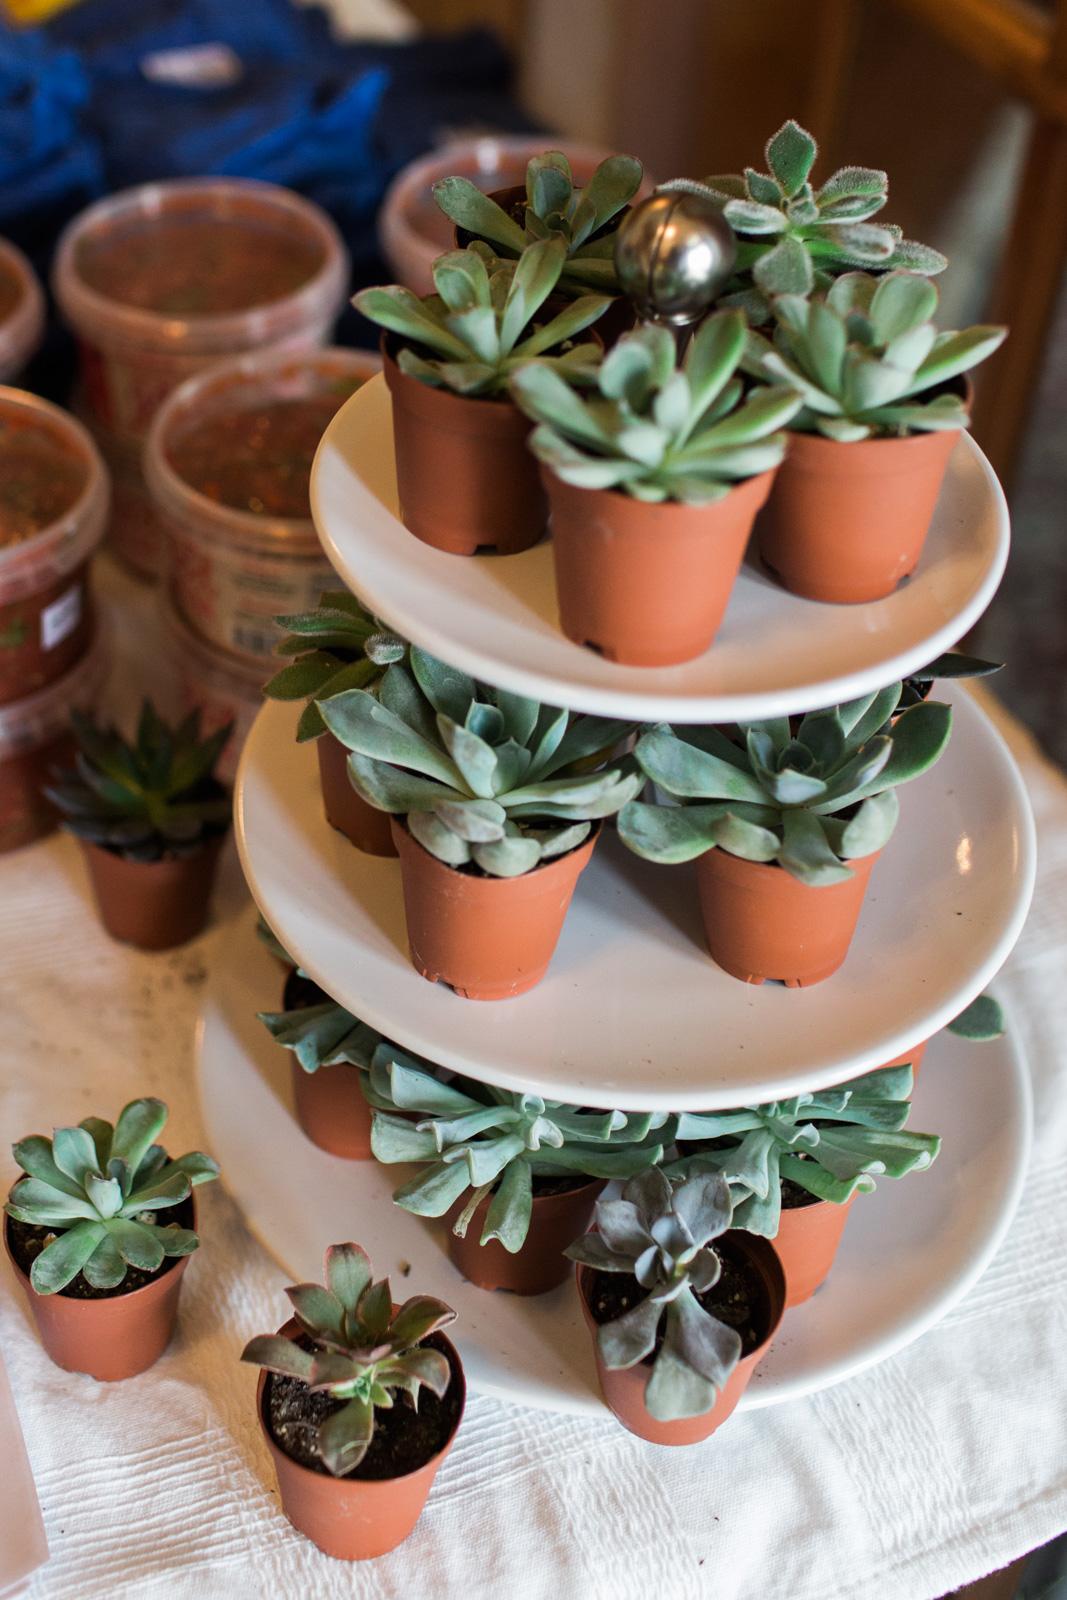 columbus-blogger-sunday-funday-event-stump-plants-9